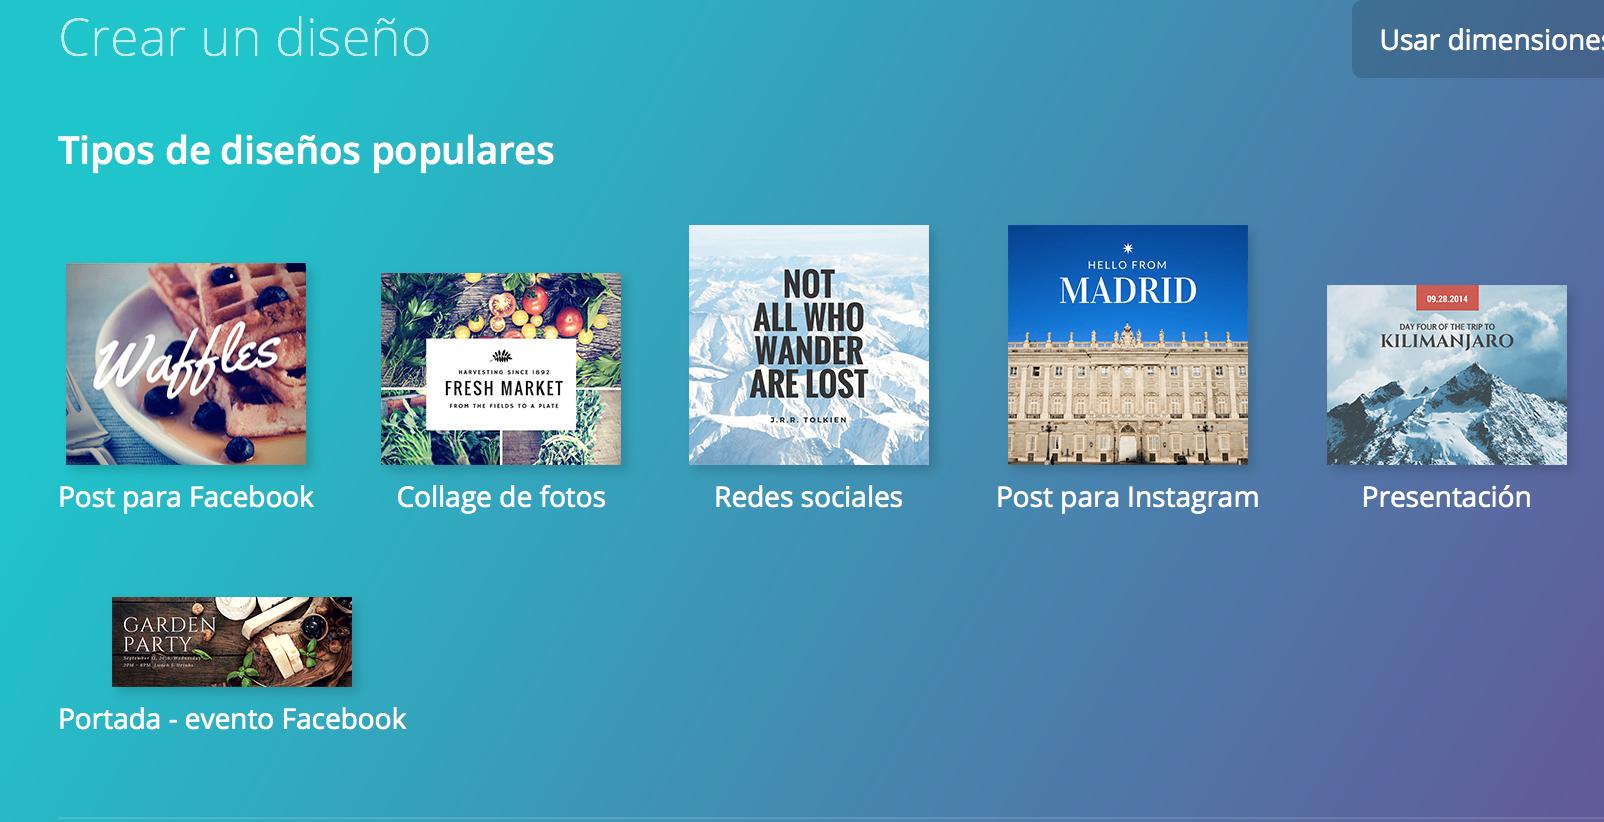 apps para crear contenidos de redes sociales: Canva